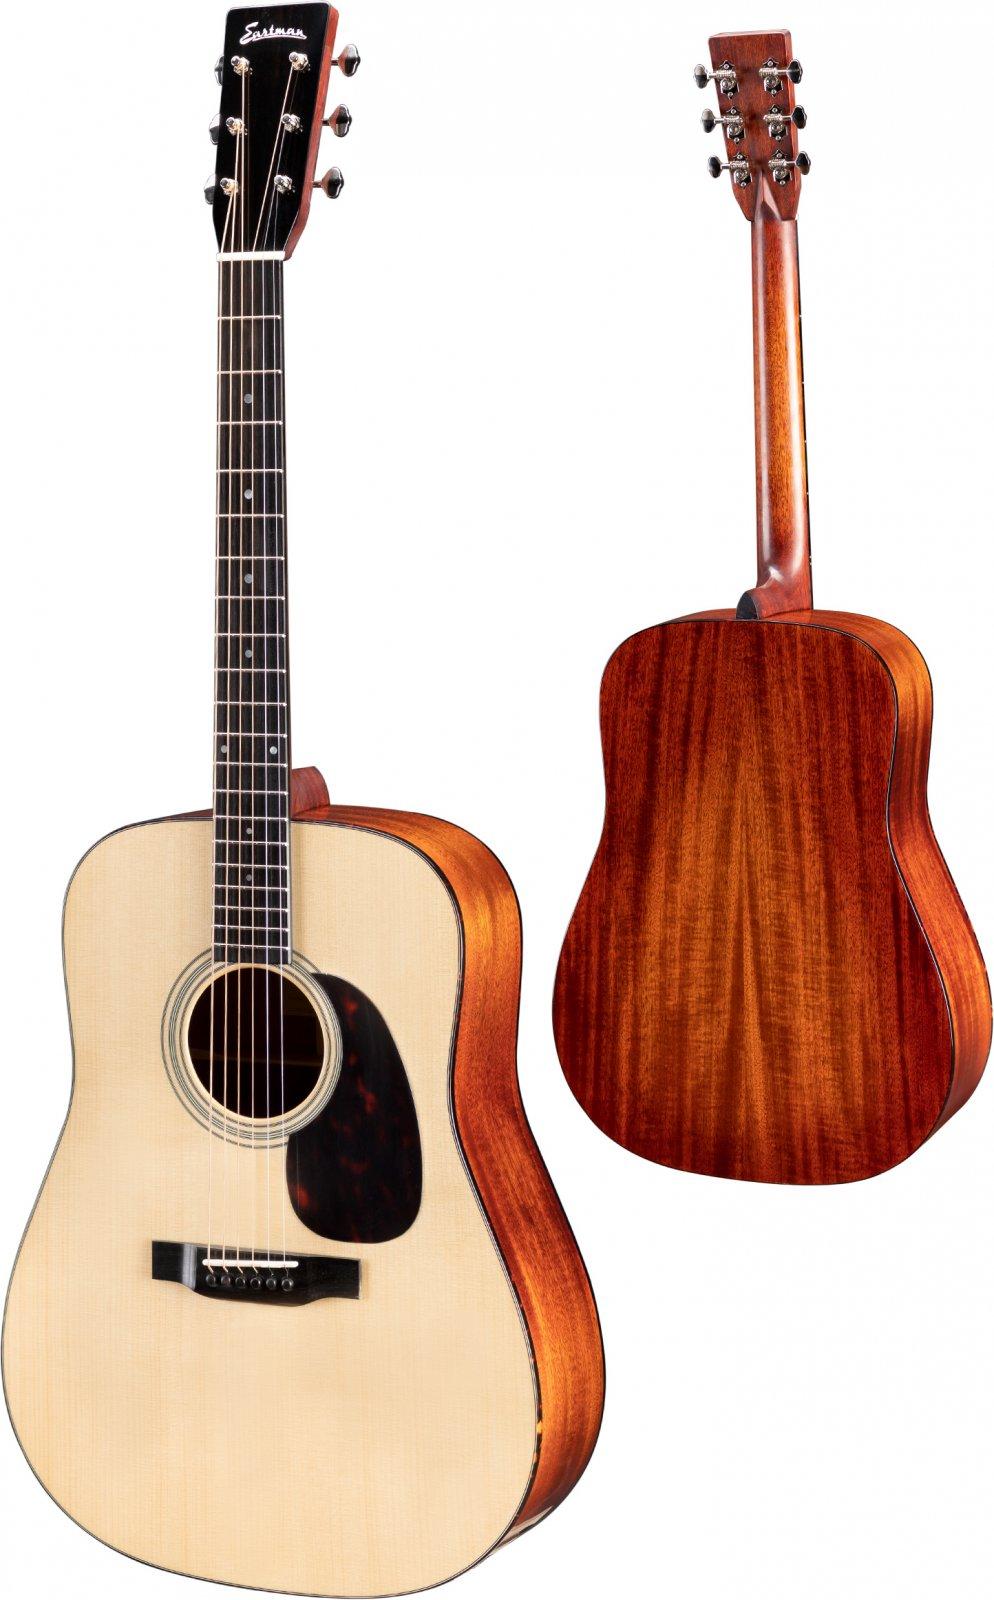 Eastman Dreadnought E10D Acoustic Guitar W/Hardshell Case